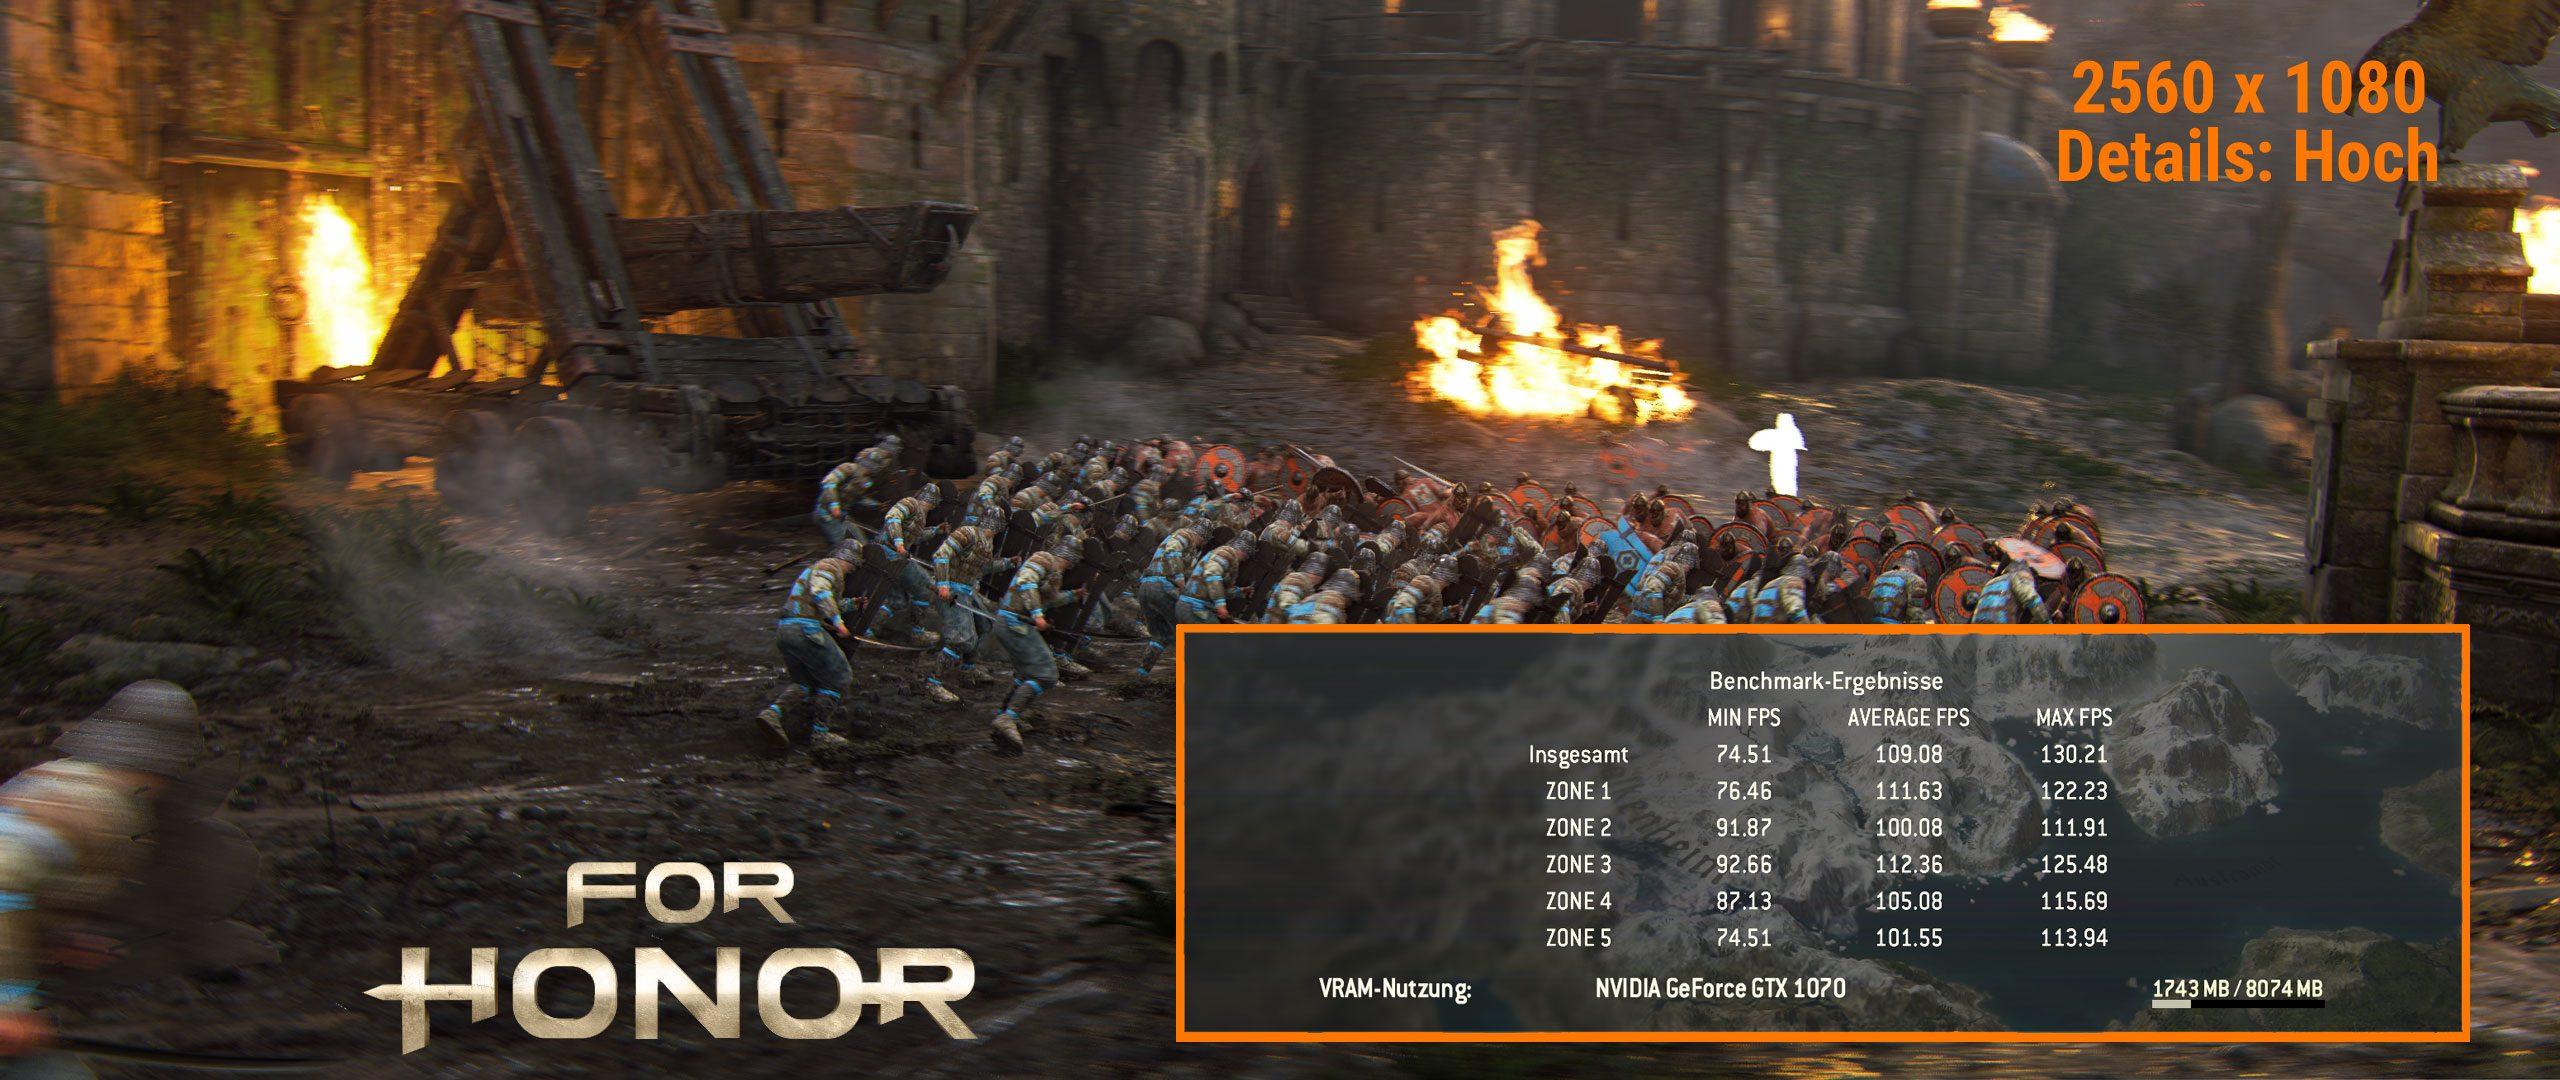 Acer-Predator-17-G9-793-718-Games-Monitor-6